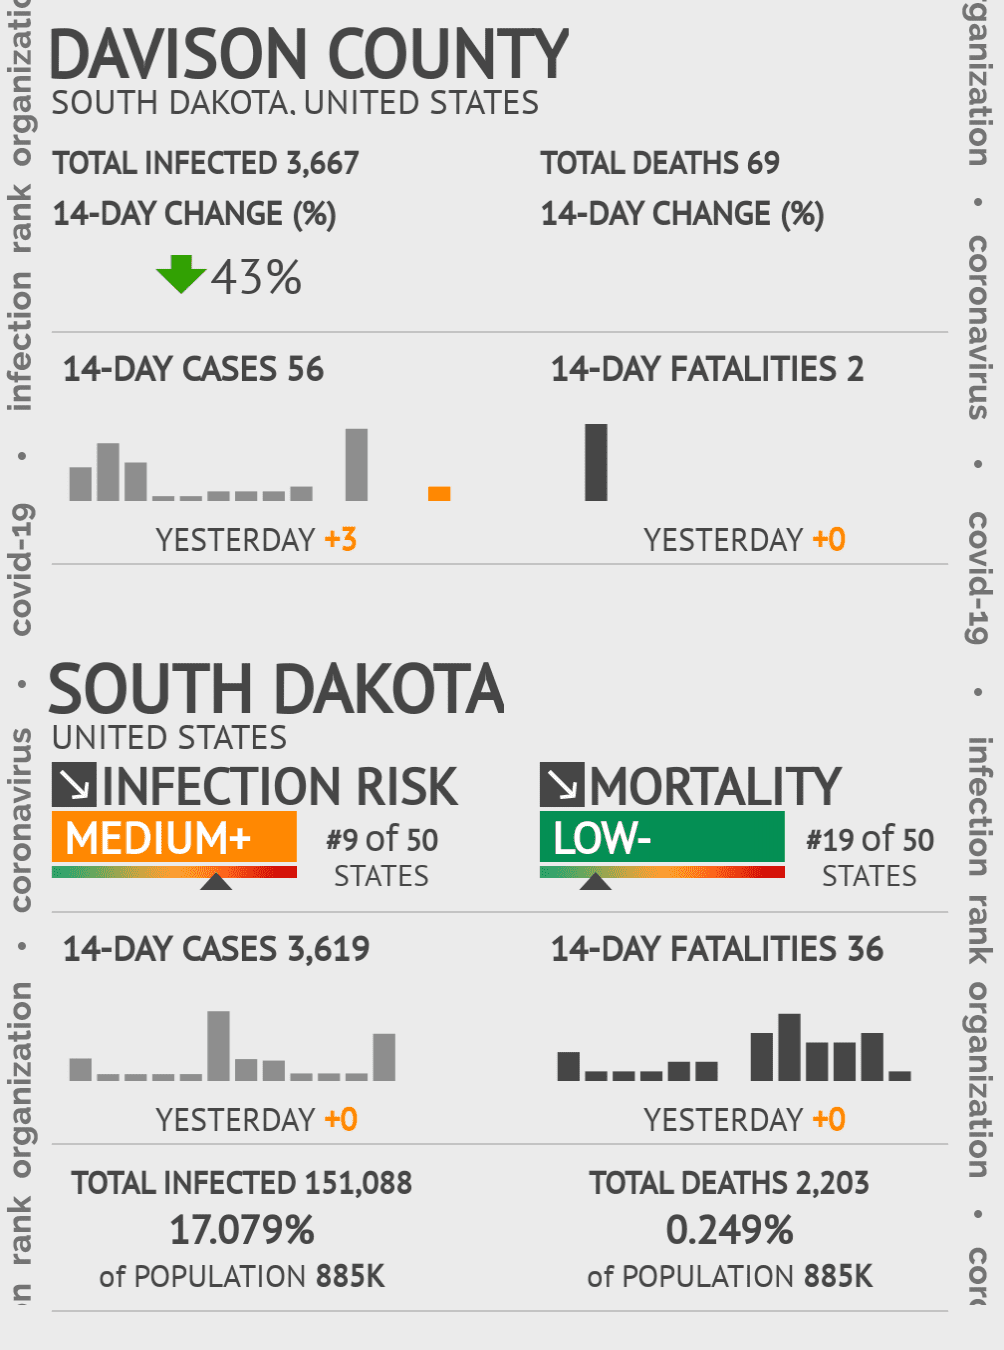 Davison County Coronavirus Covid-19 Risk of Infection on February 28, 2021